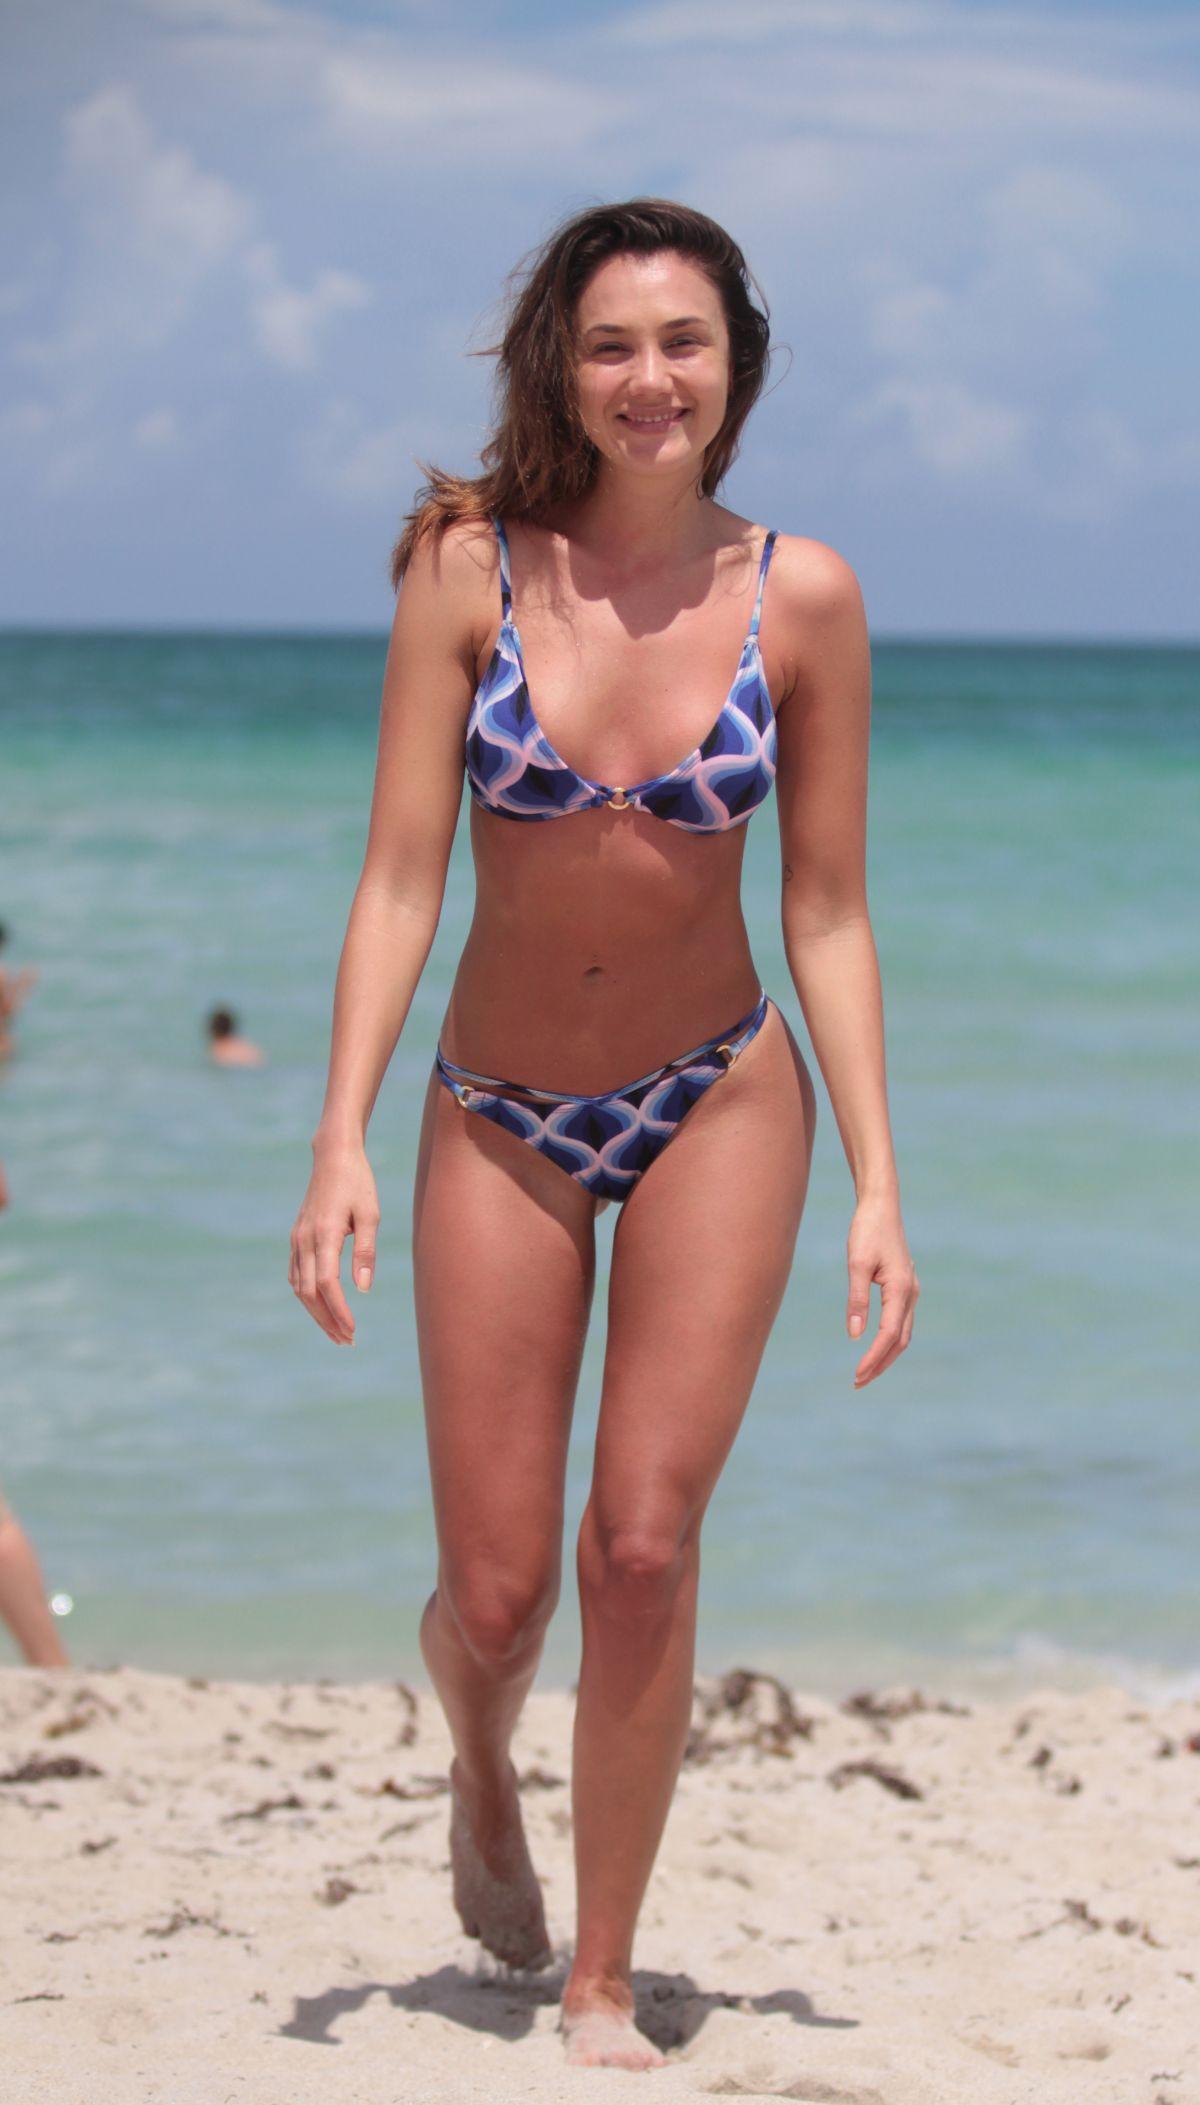 Celebrity Michelle Pieroway nude (98 photos), Sexy, Bikini, Feet, braless 2020